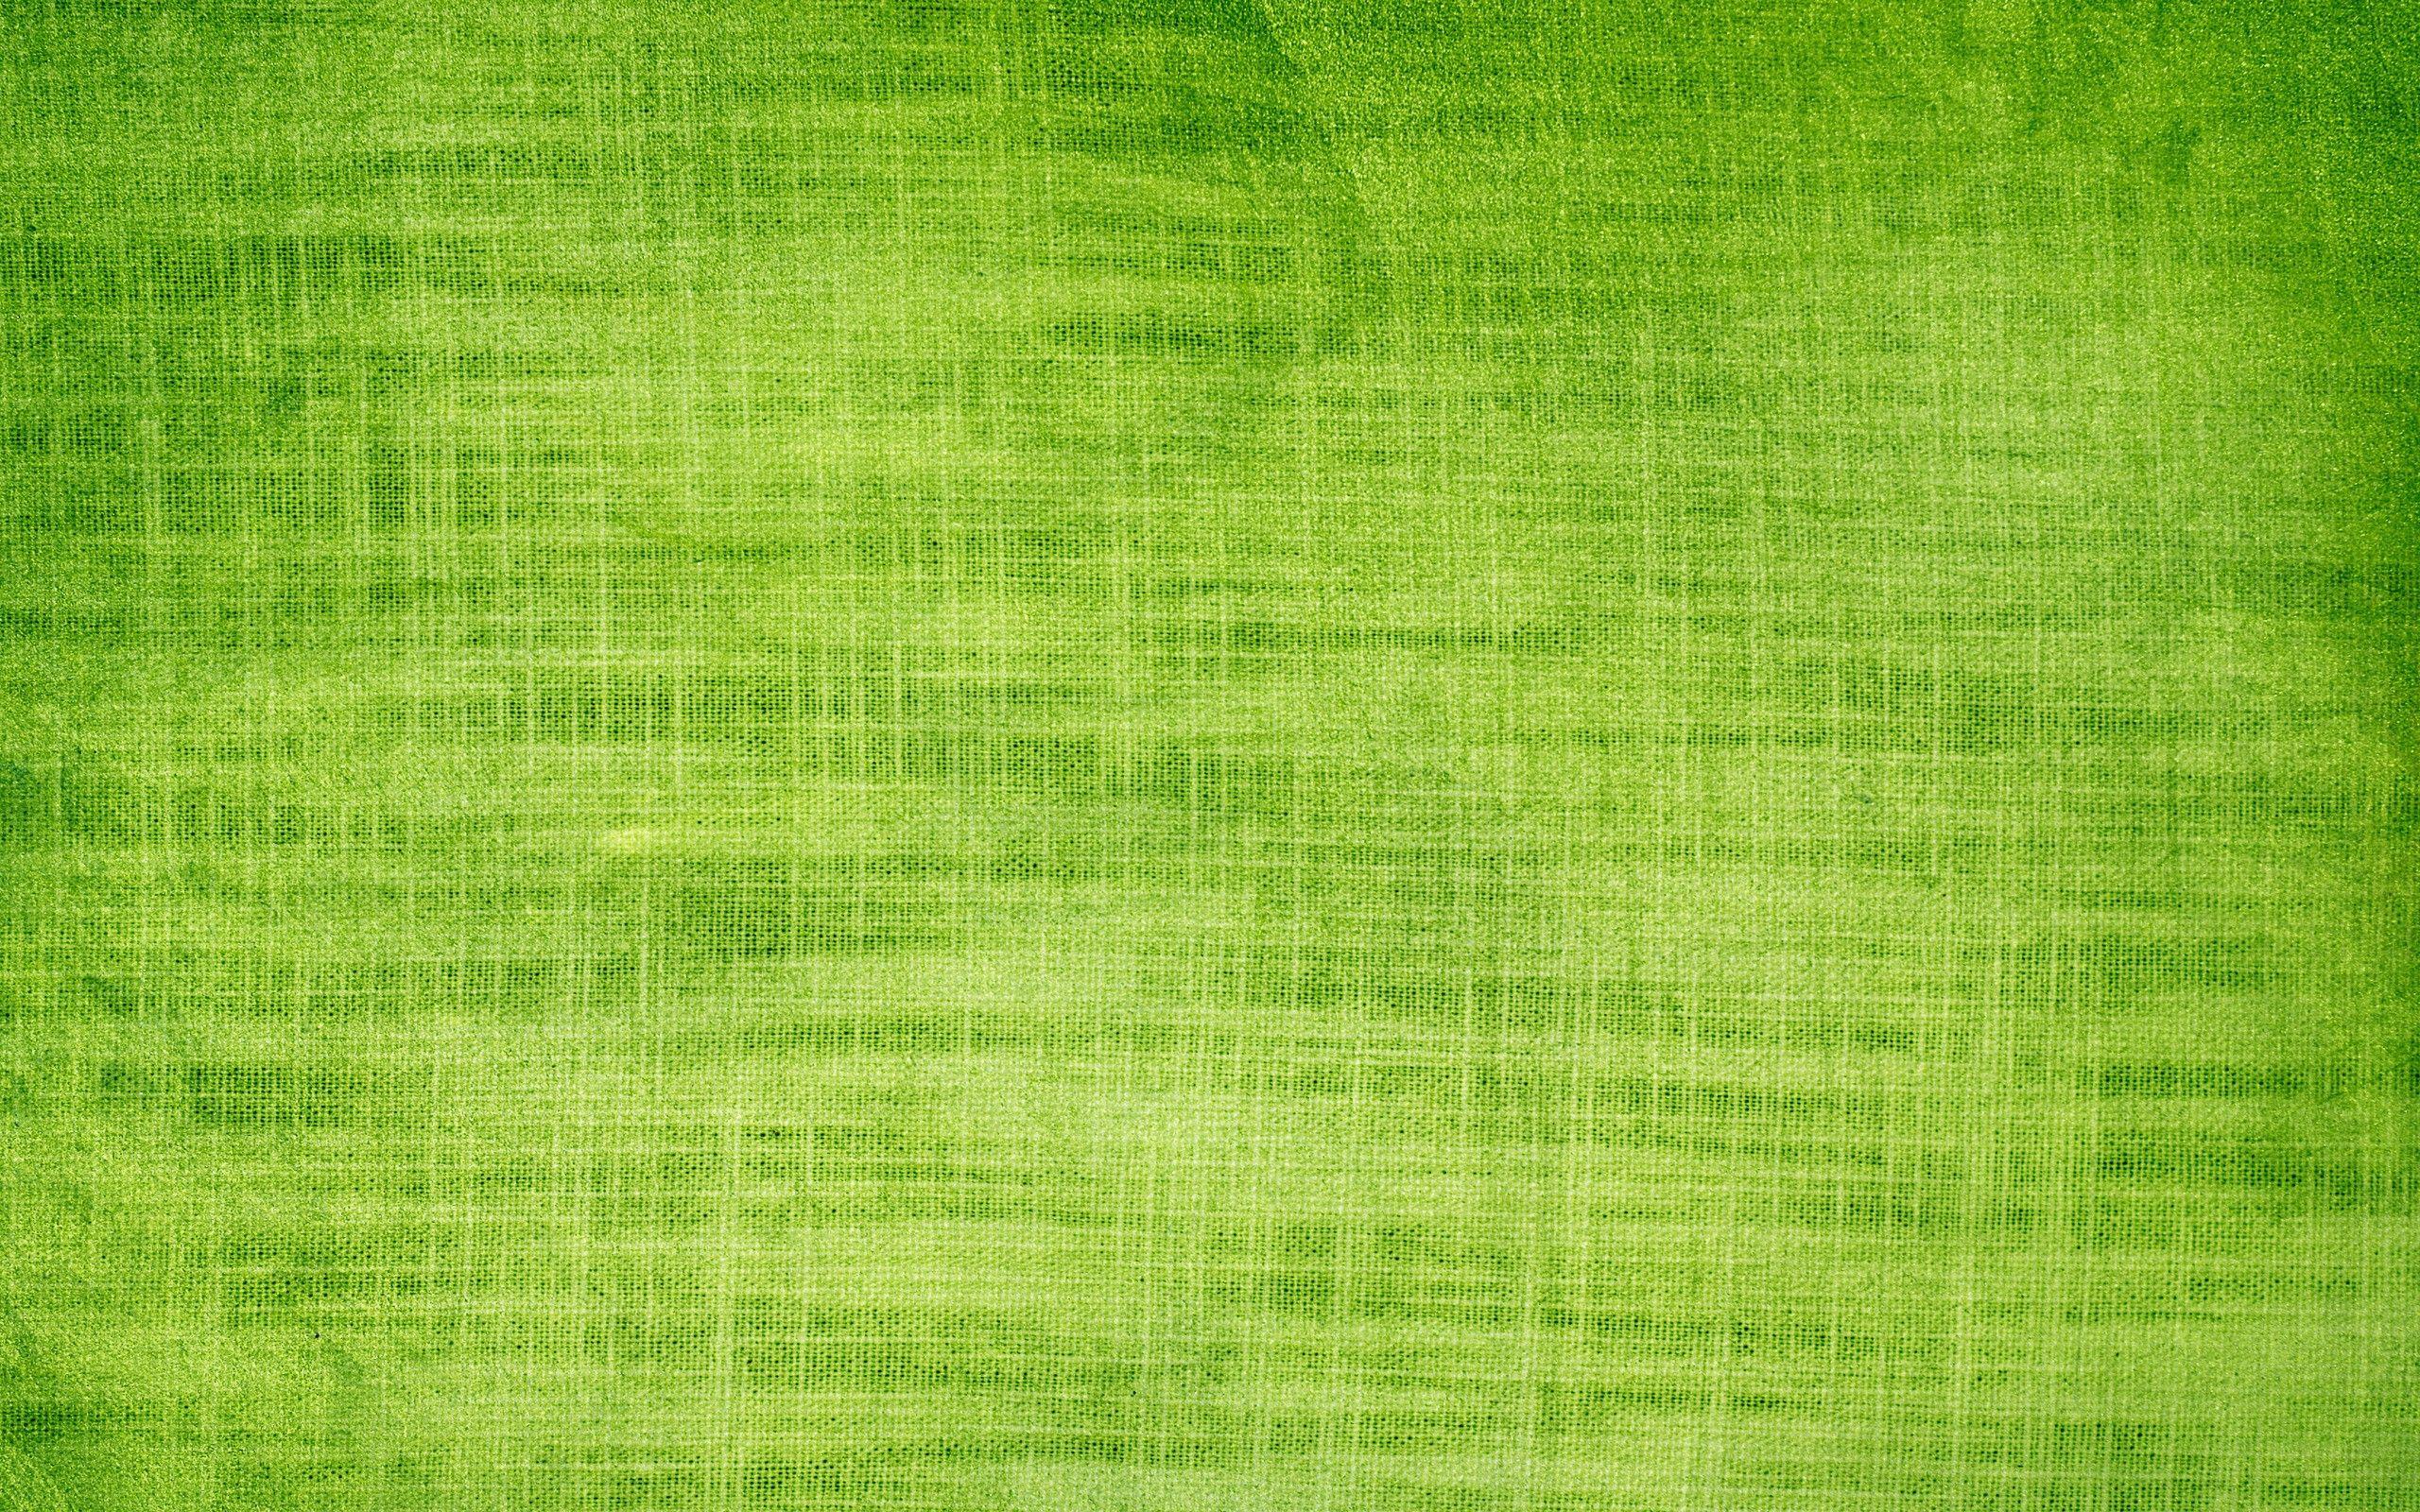 Plain Green Background HD Wallpaper